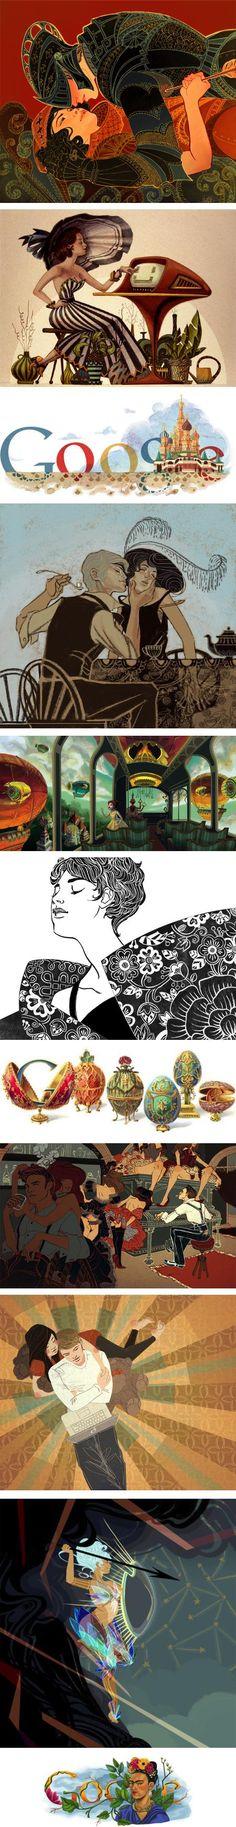 Jennifer Hom, google doodles and personal work!